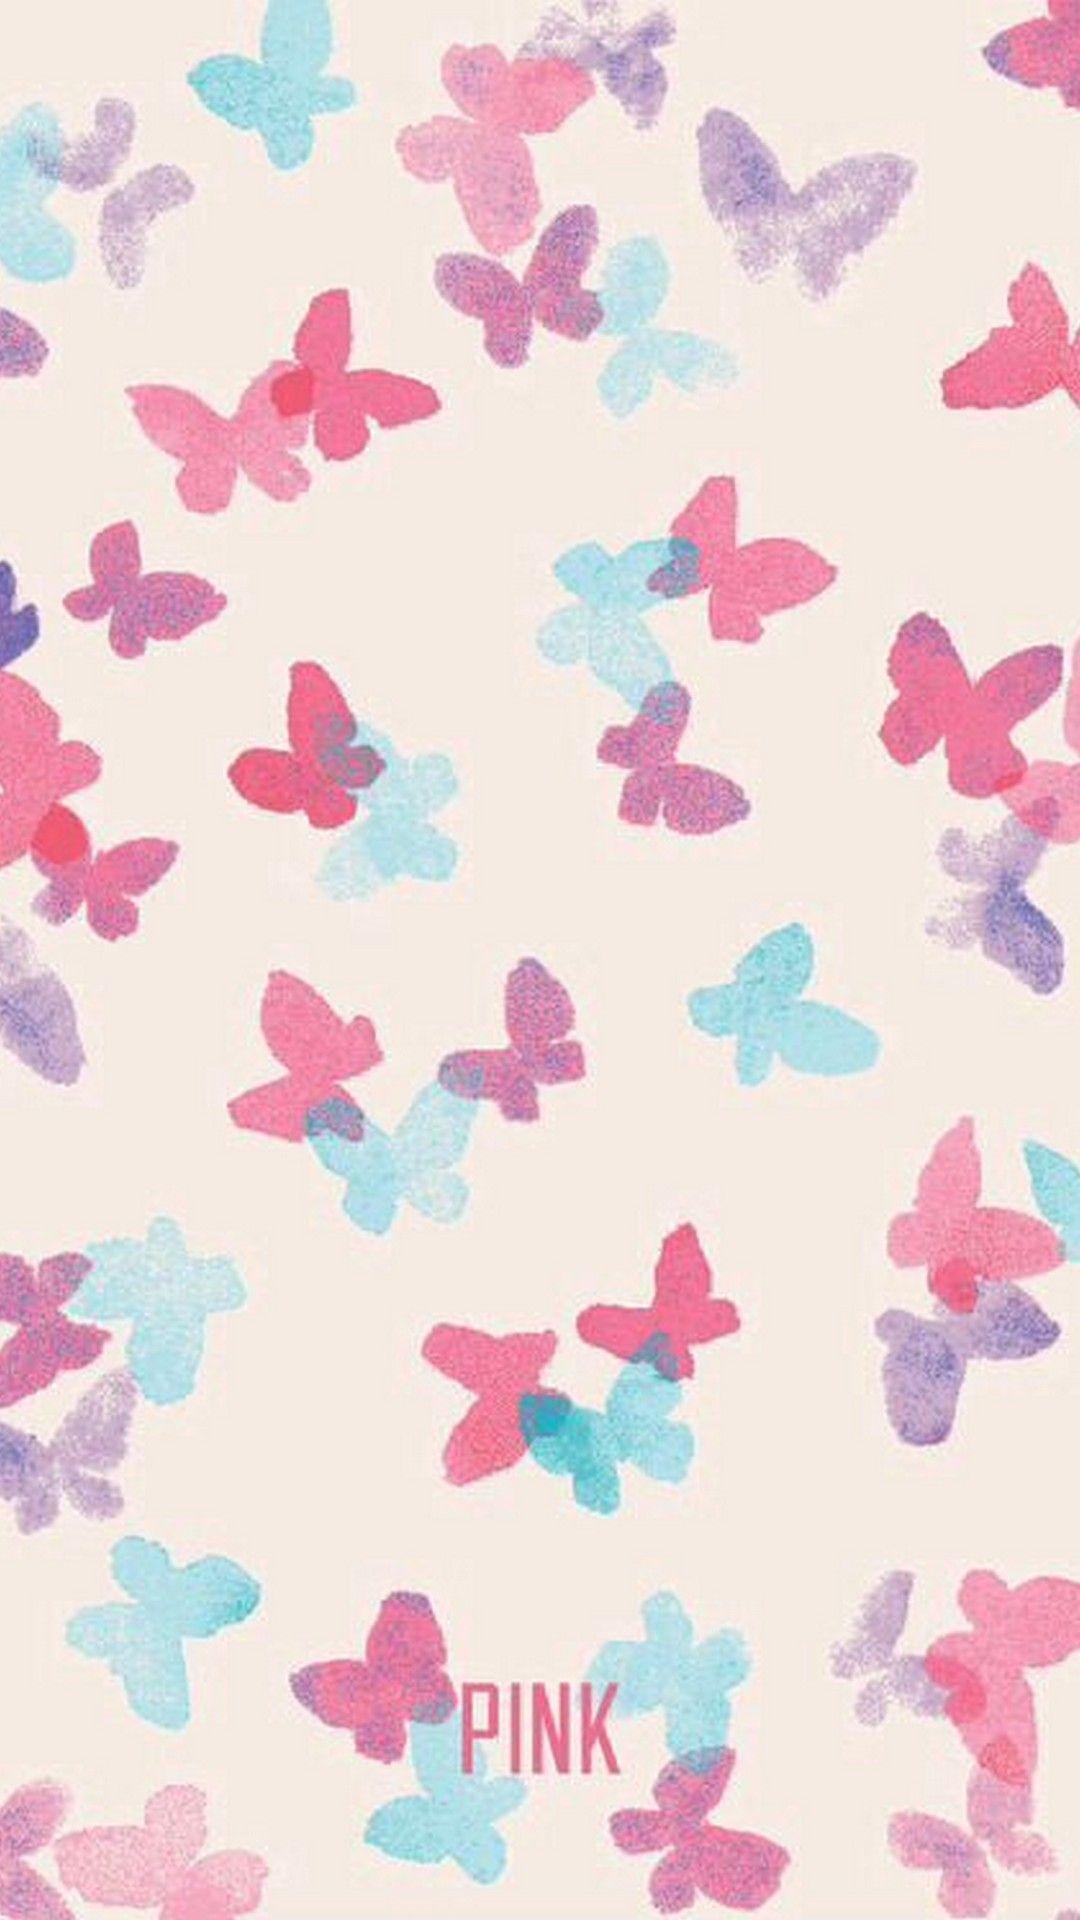 Iphone 6 Wallpaper Cute Girly Best Hd Wallpapers Victoria Secret Pink Wallpaper Vs Pink Wallpaper Victoria Secret Wallpaper